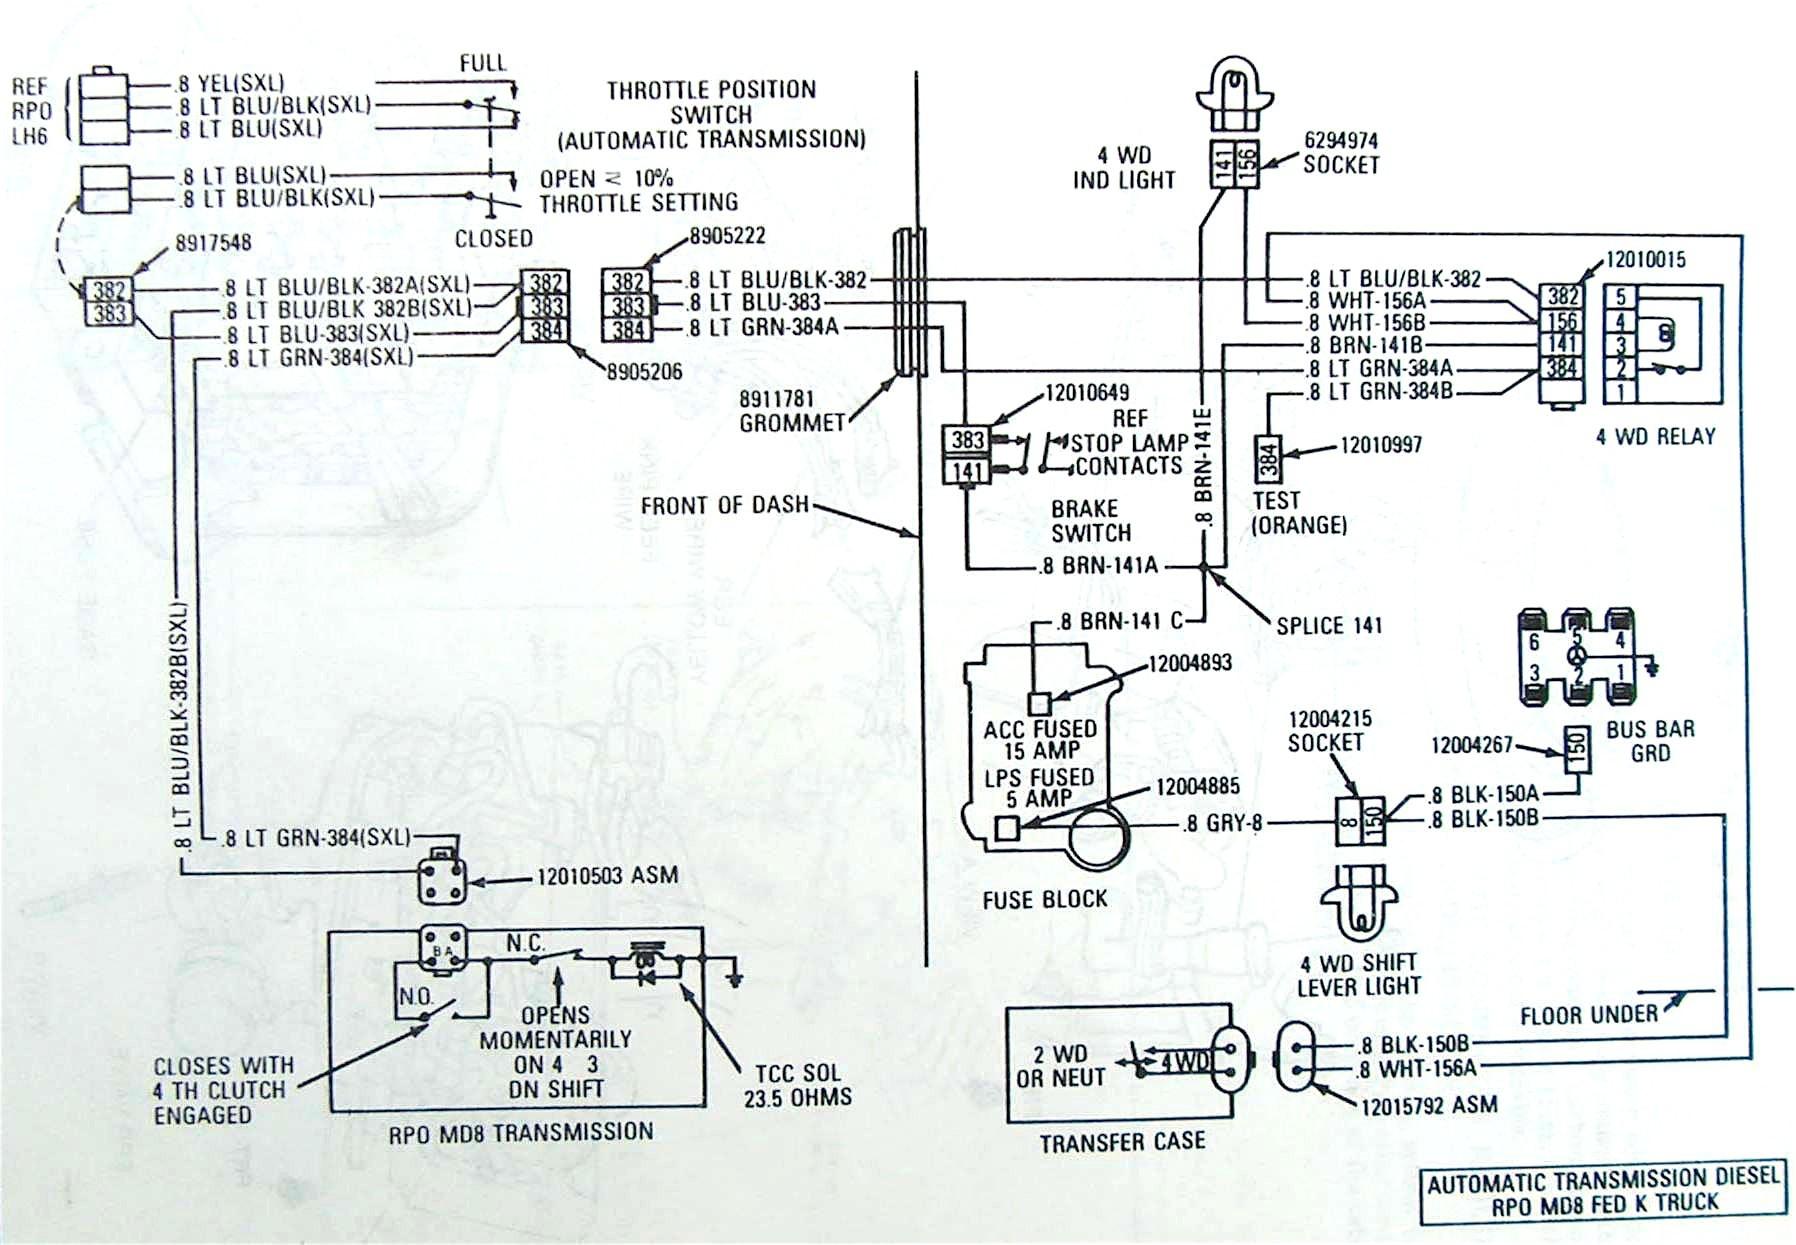 Chevy 700r4 Wiring Diagram | Machine Repair Manual on